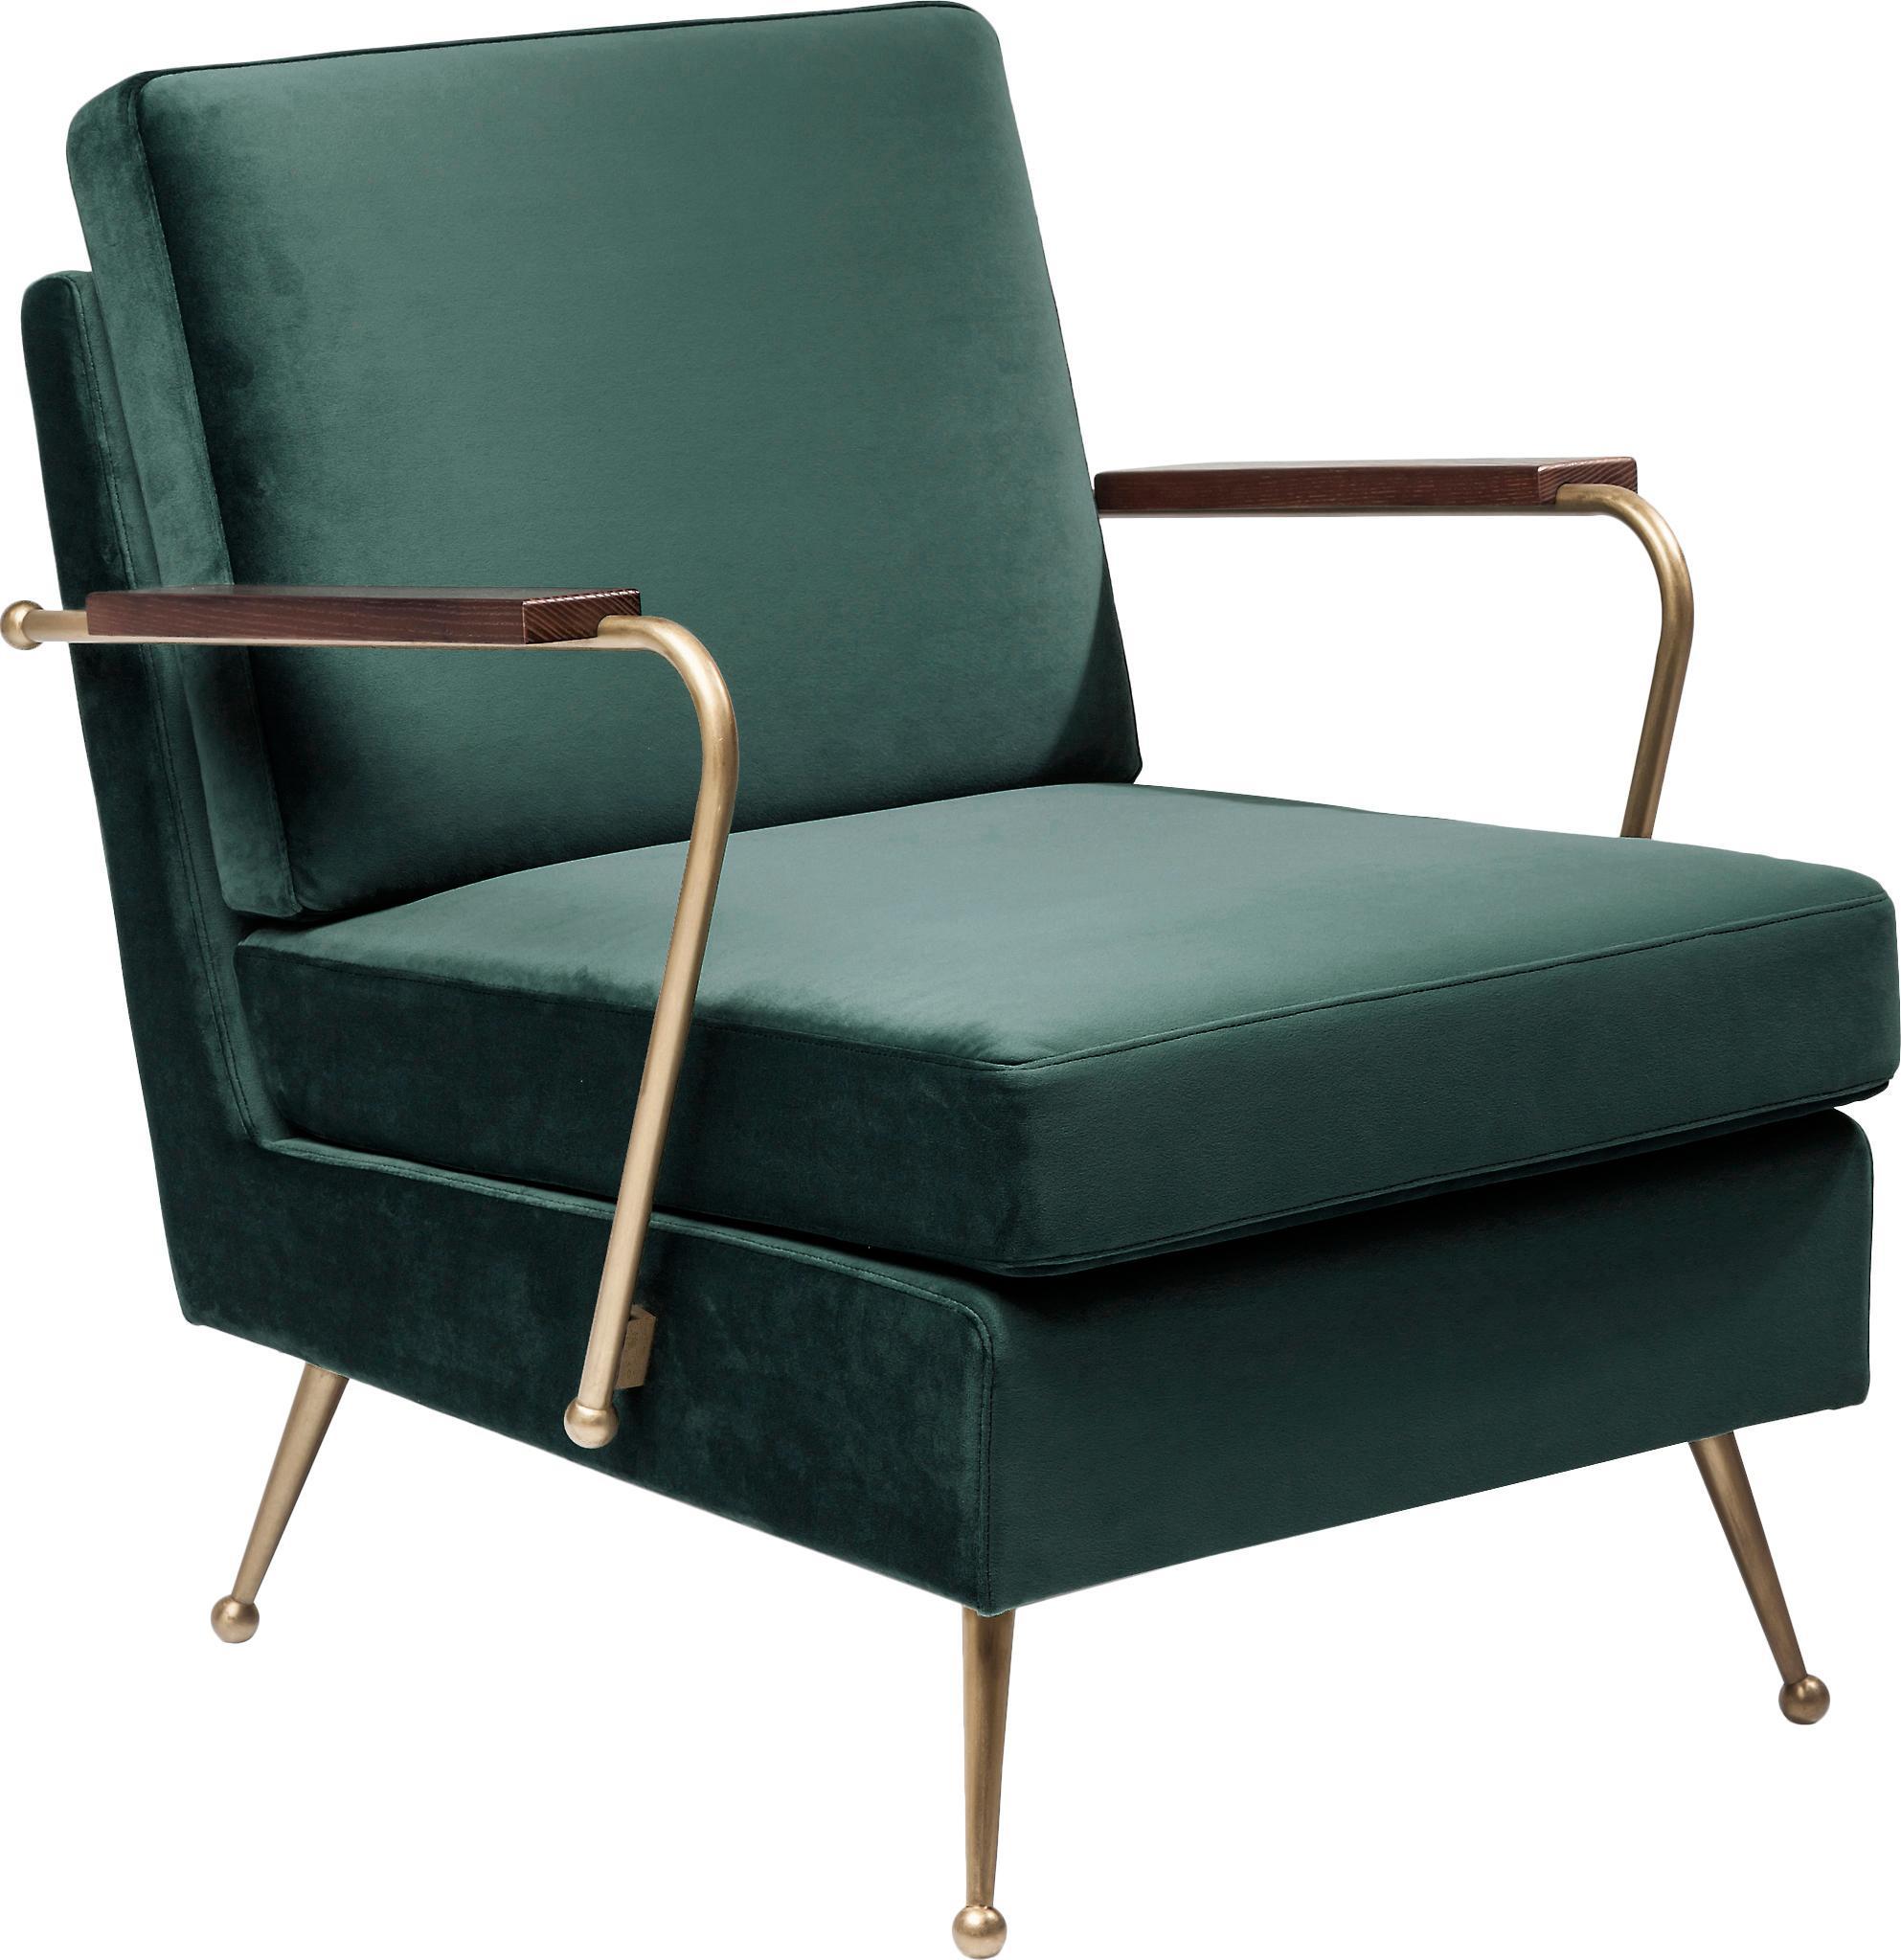 Retro fluwelen fauteuil Gamble in groen, Bekleding: 100% polyester (fluweel), Frame: onbehandeld grenenhout, Groen, B 68 x D 75 cm